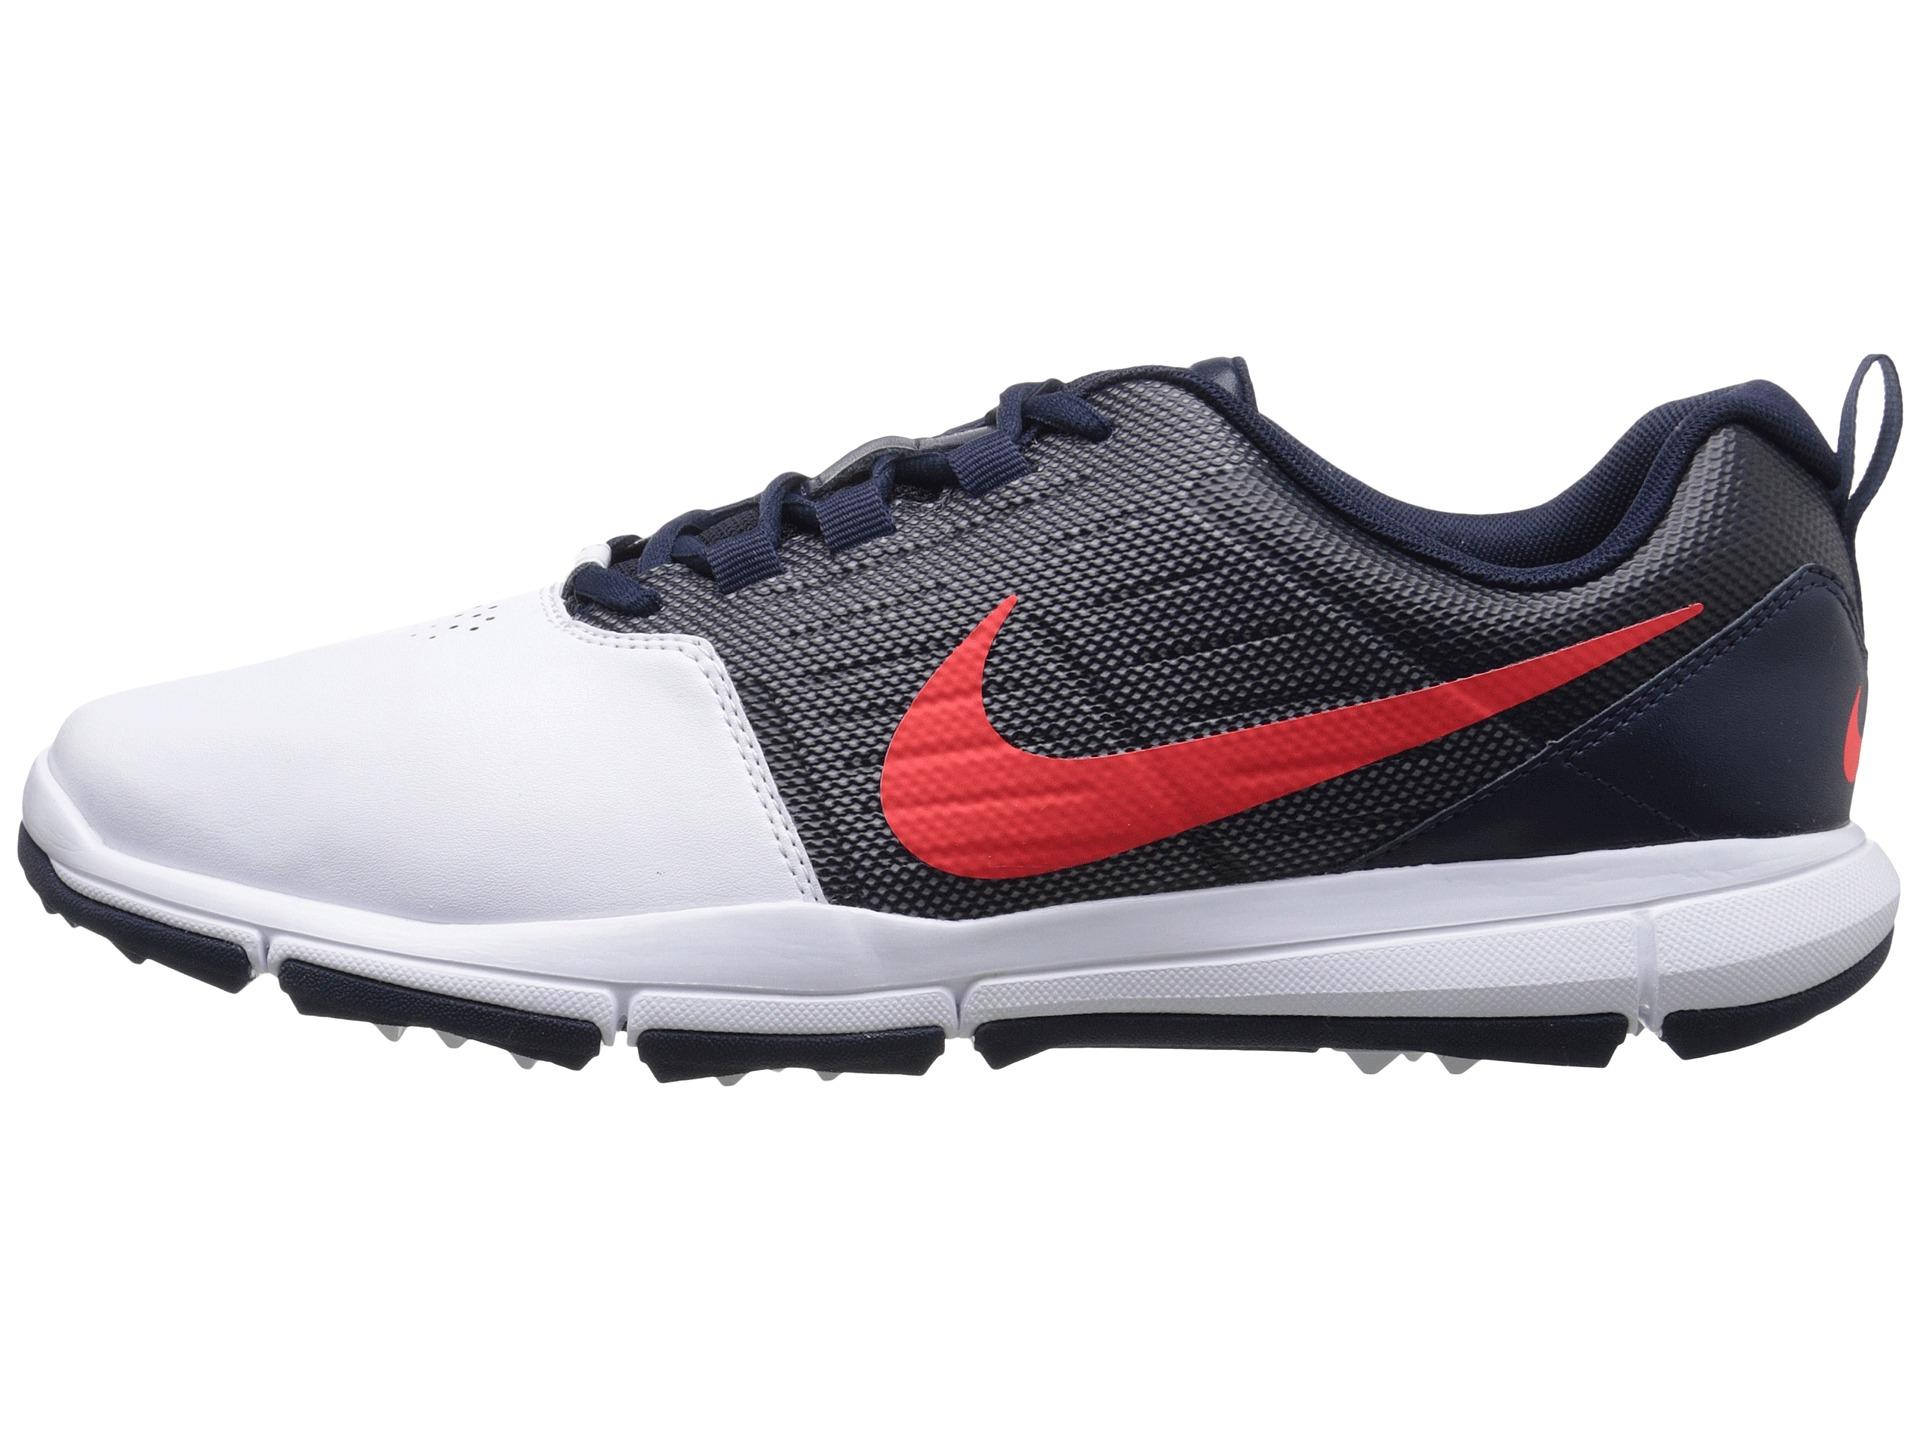 separation shoes a0340 e3d19 Lyst - Nike Explorer Sl in Black for Men